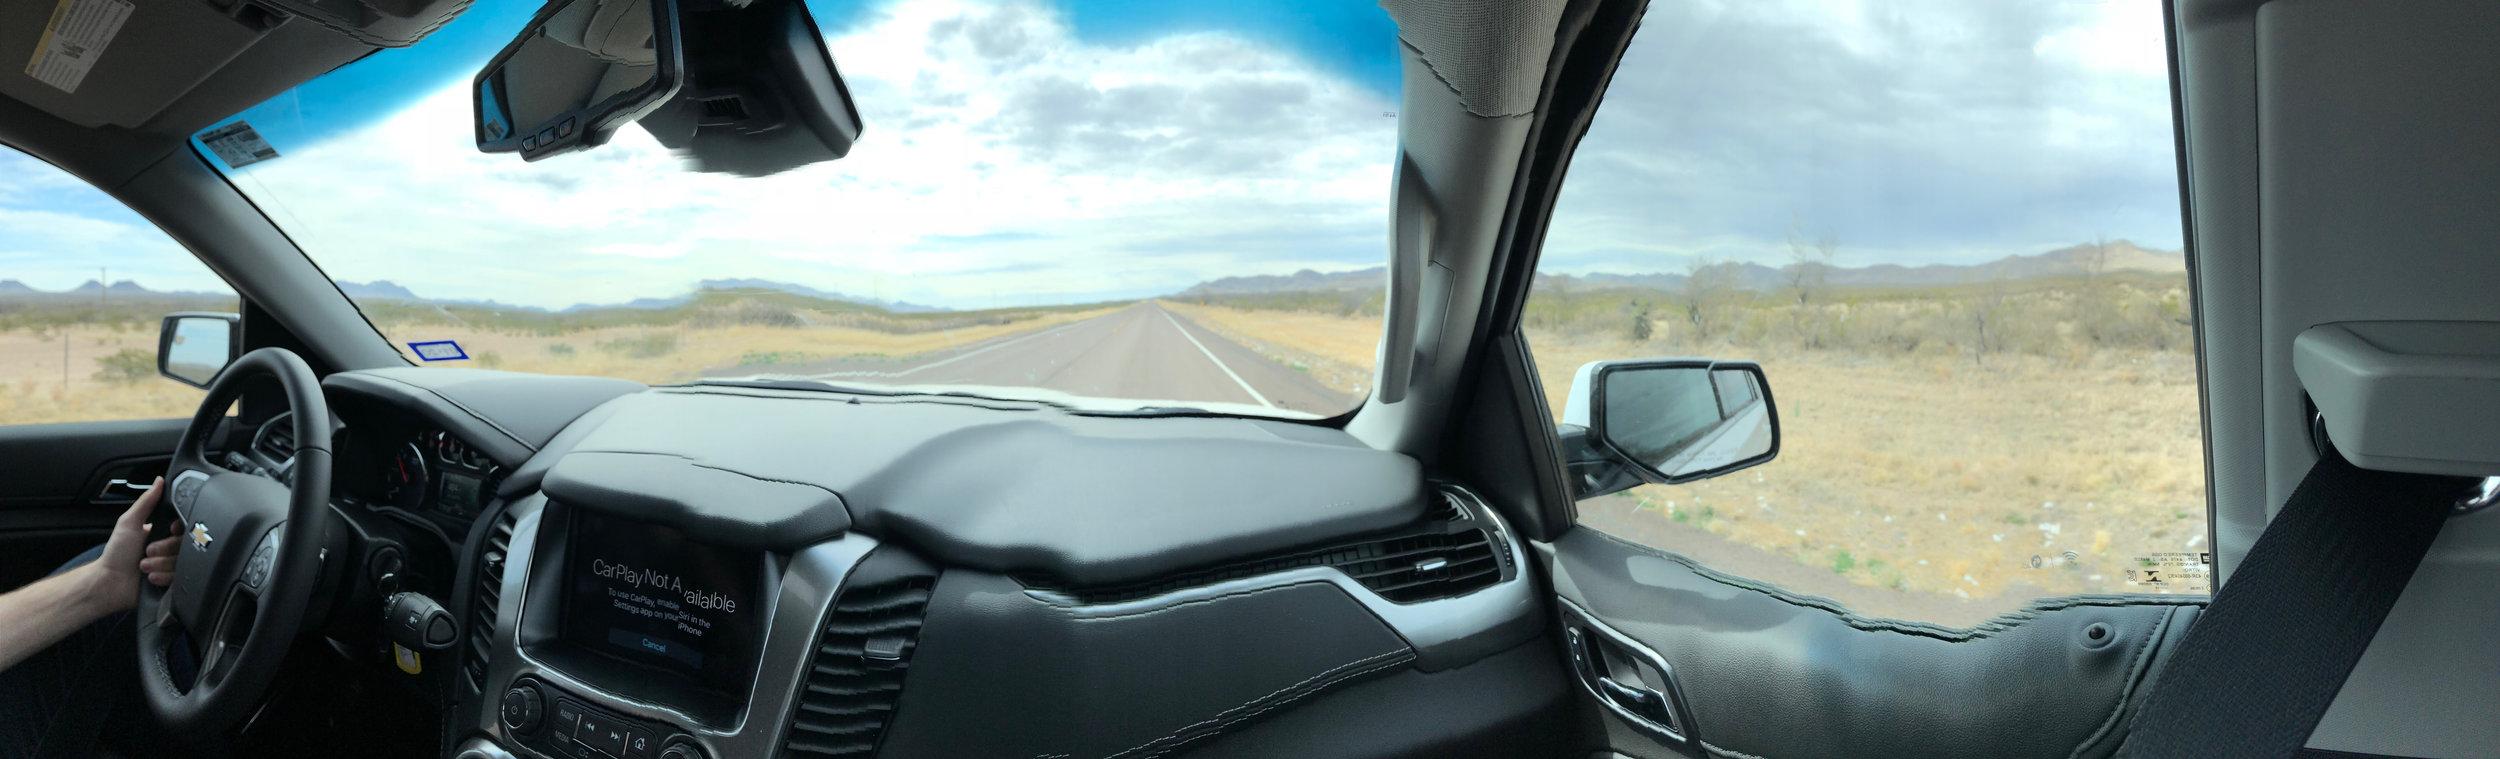 car interior.jpg